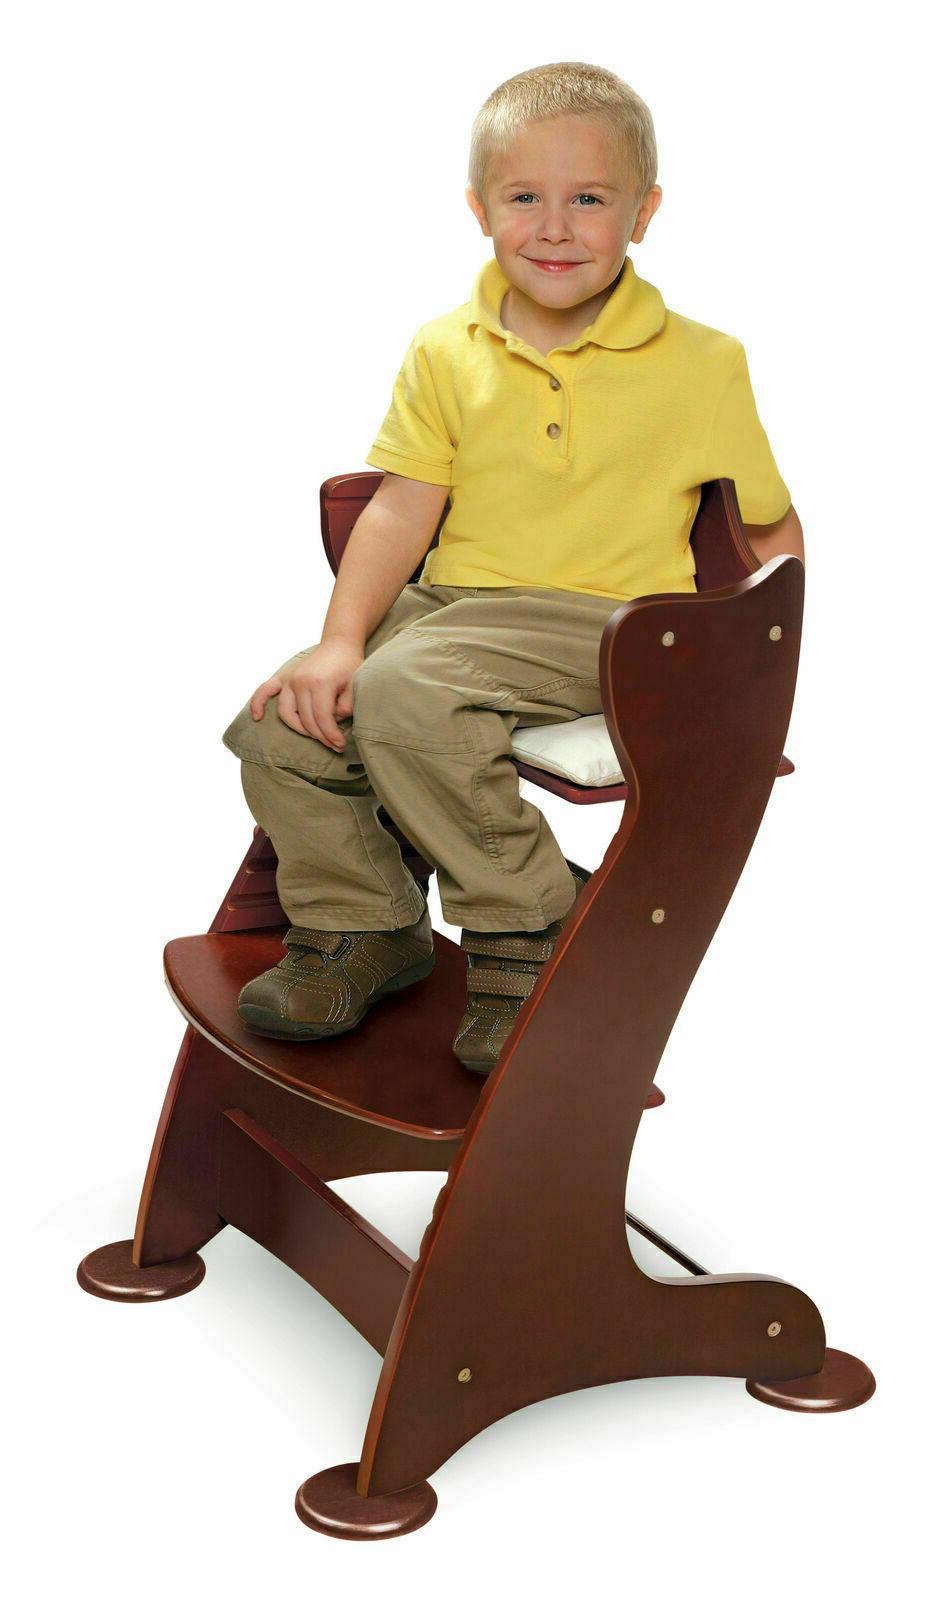 High Chair Feeding Convertible Tray Toddler